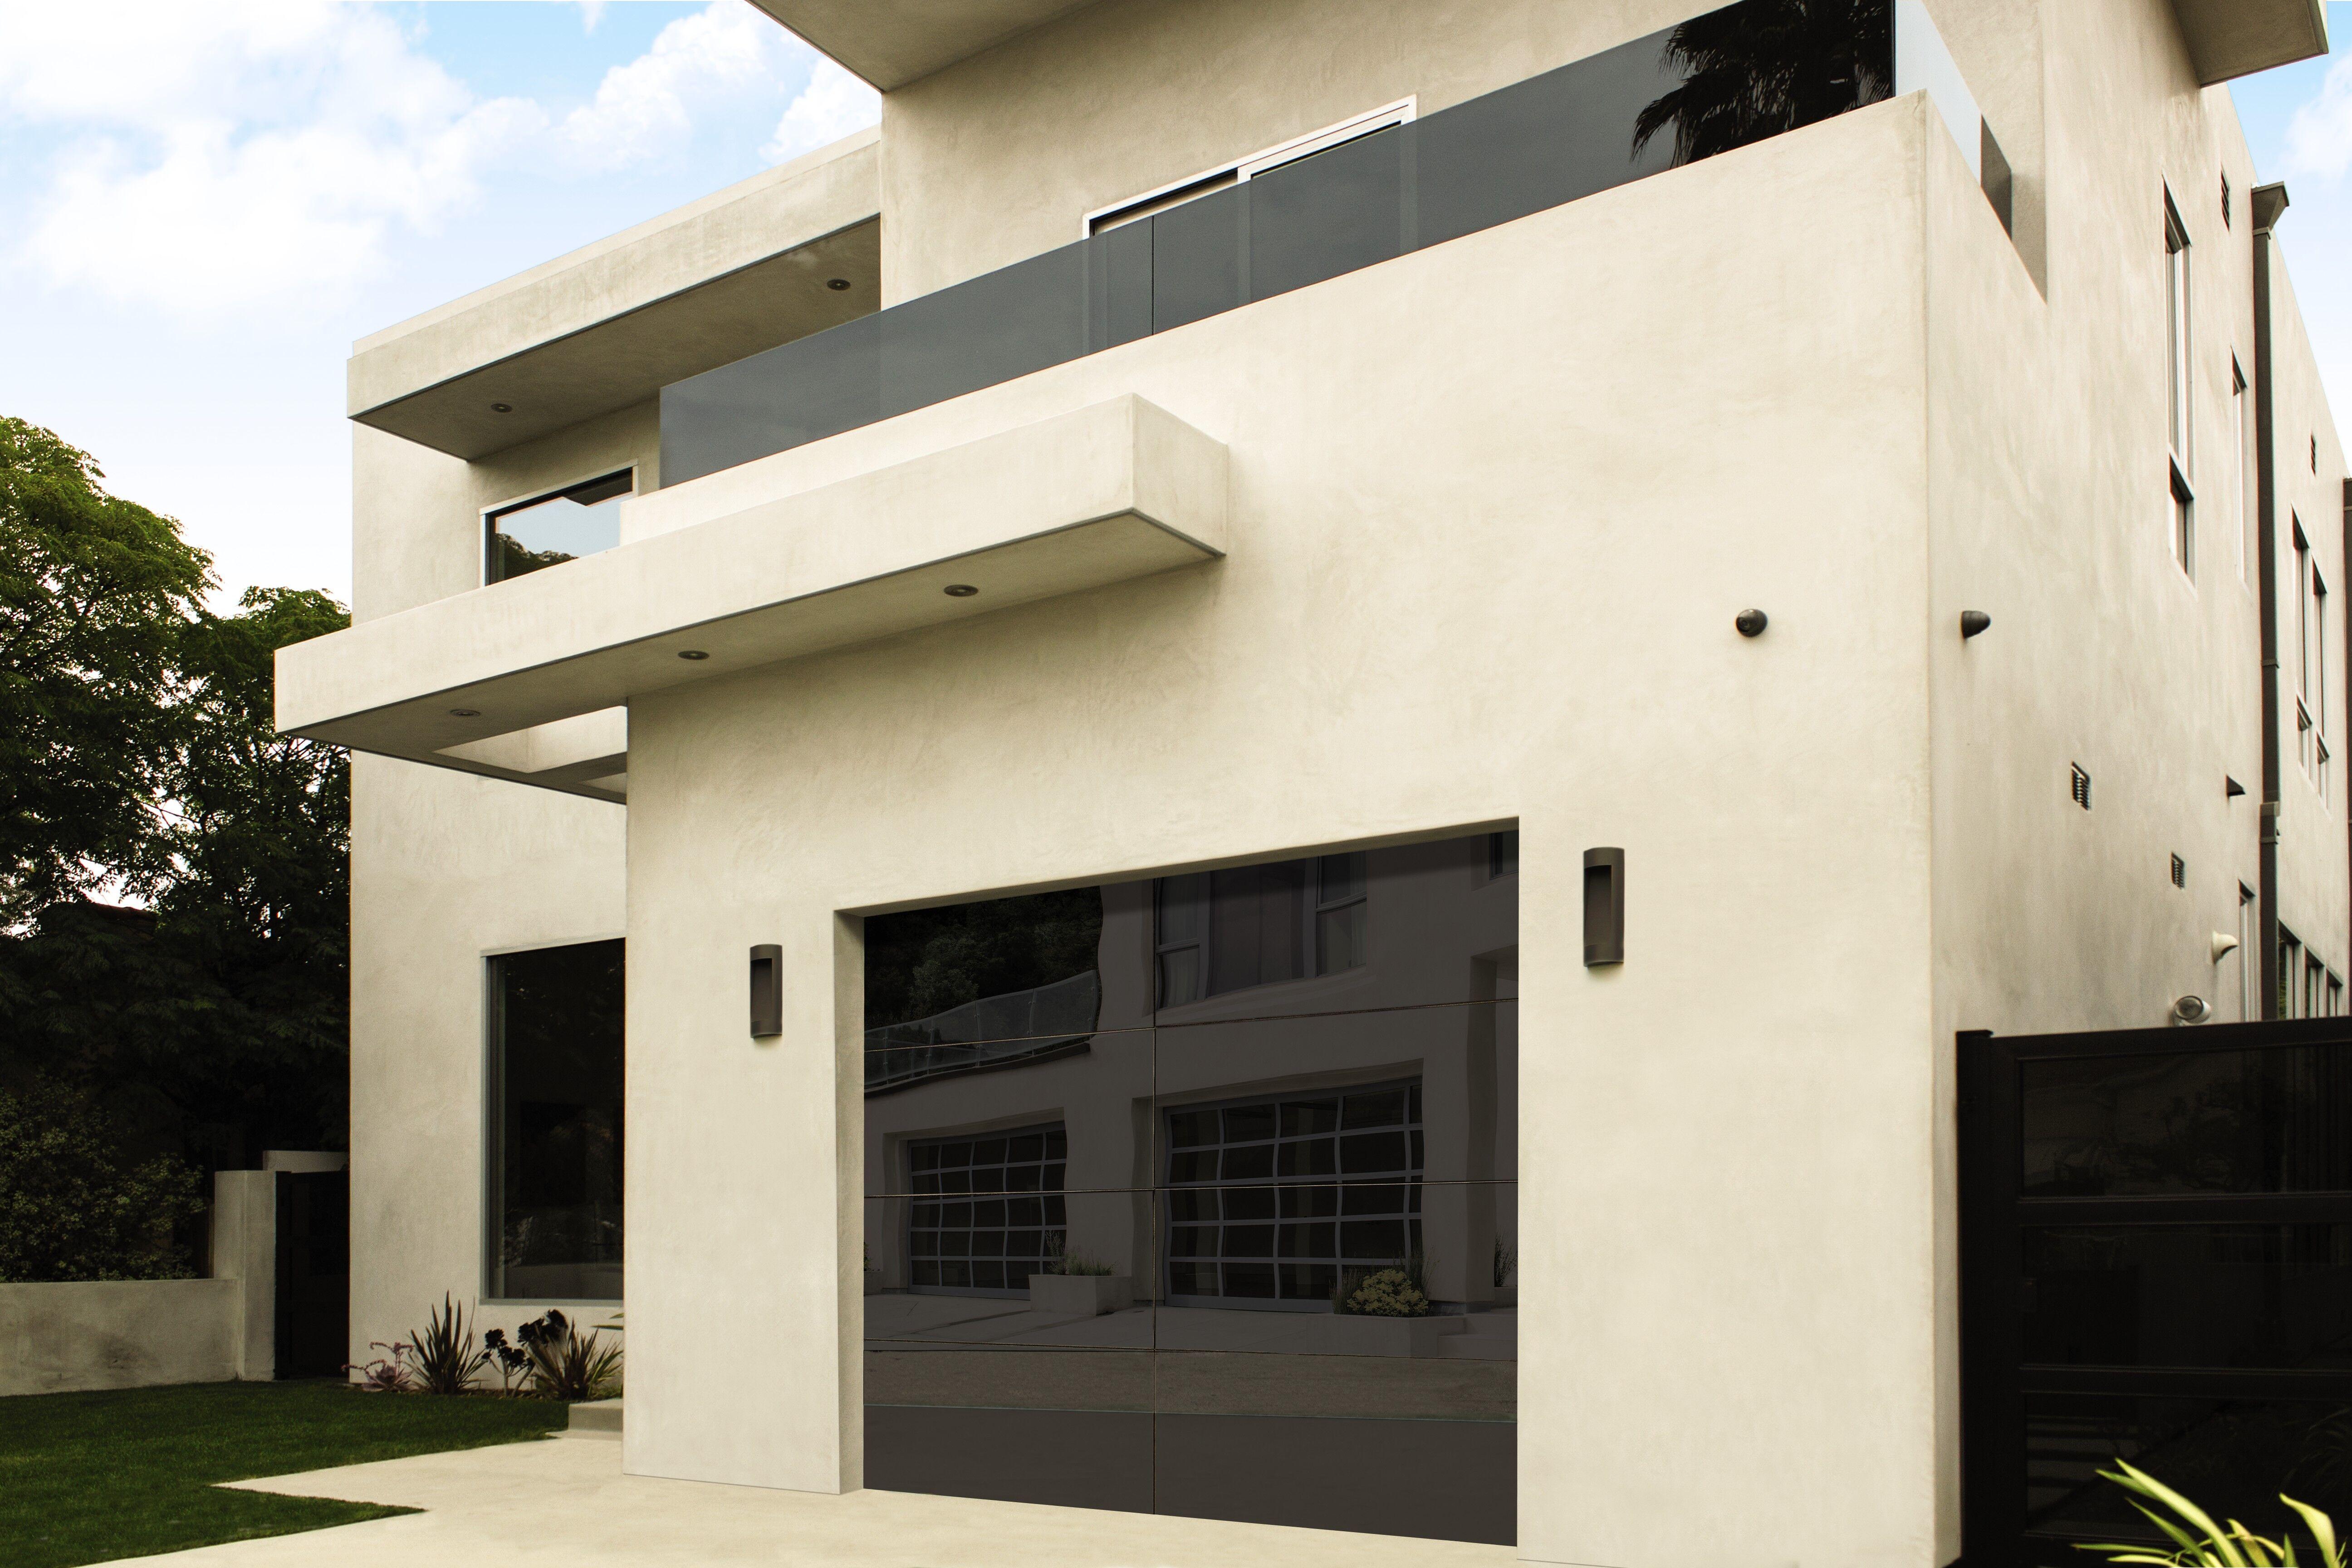 wayne dalton RD-8450 luminous opaque black garage door